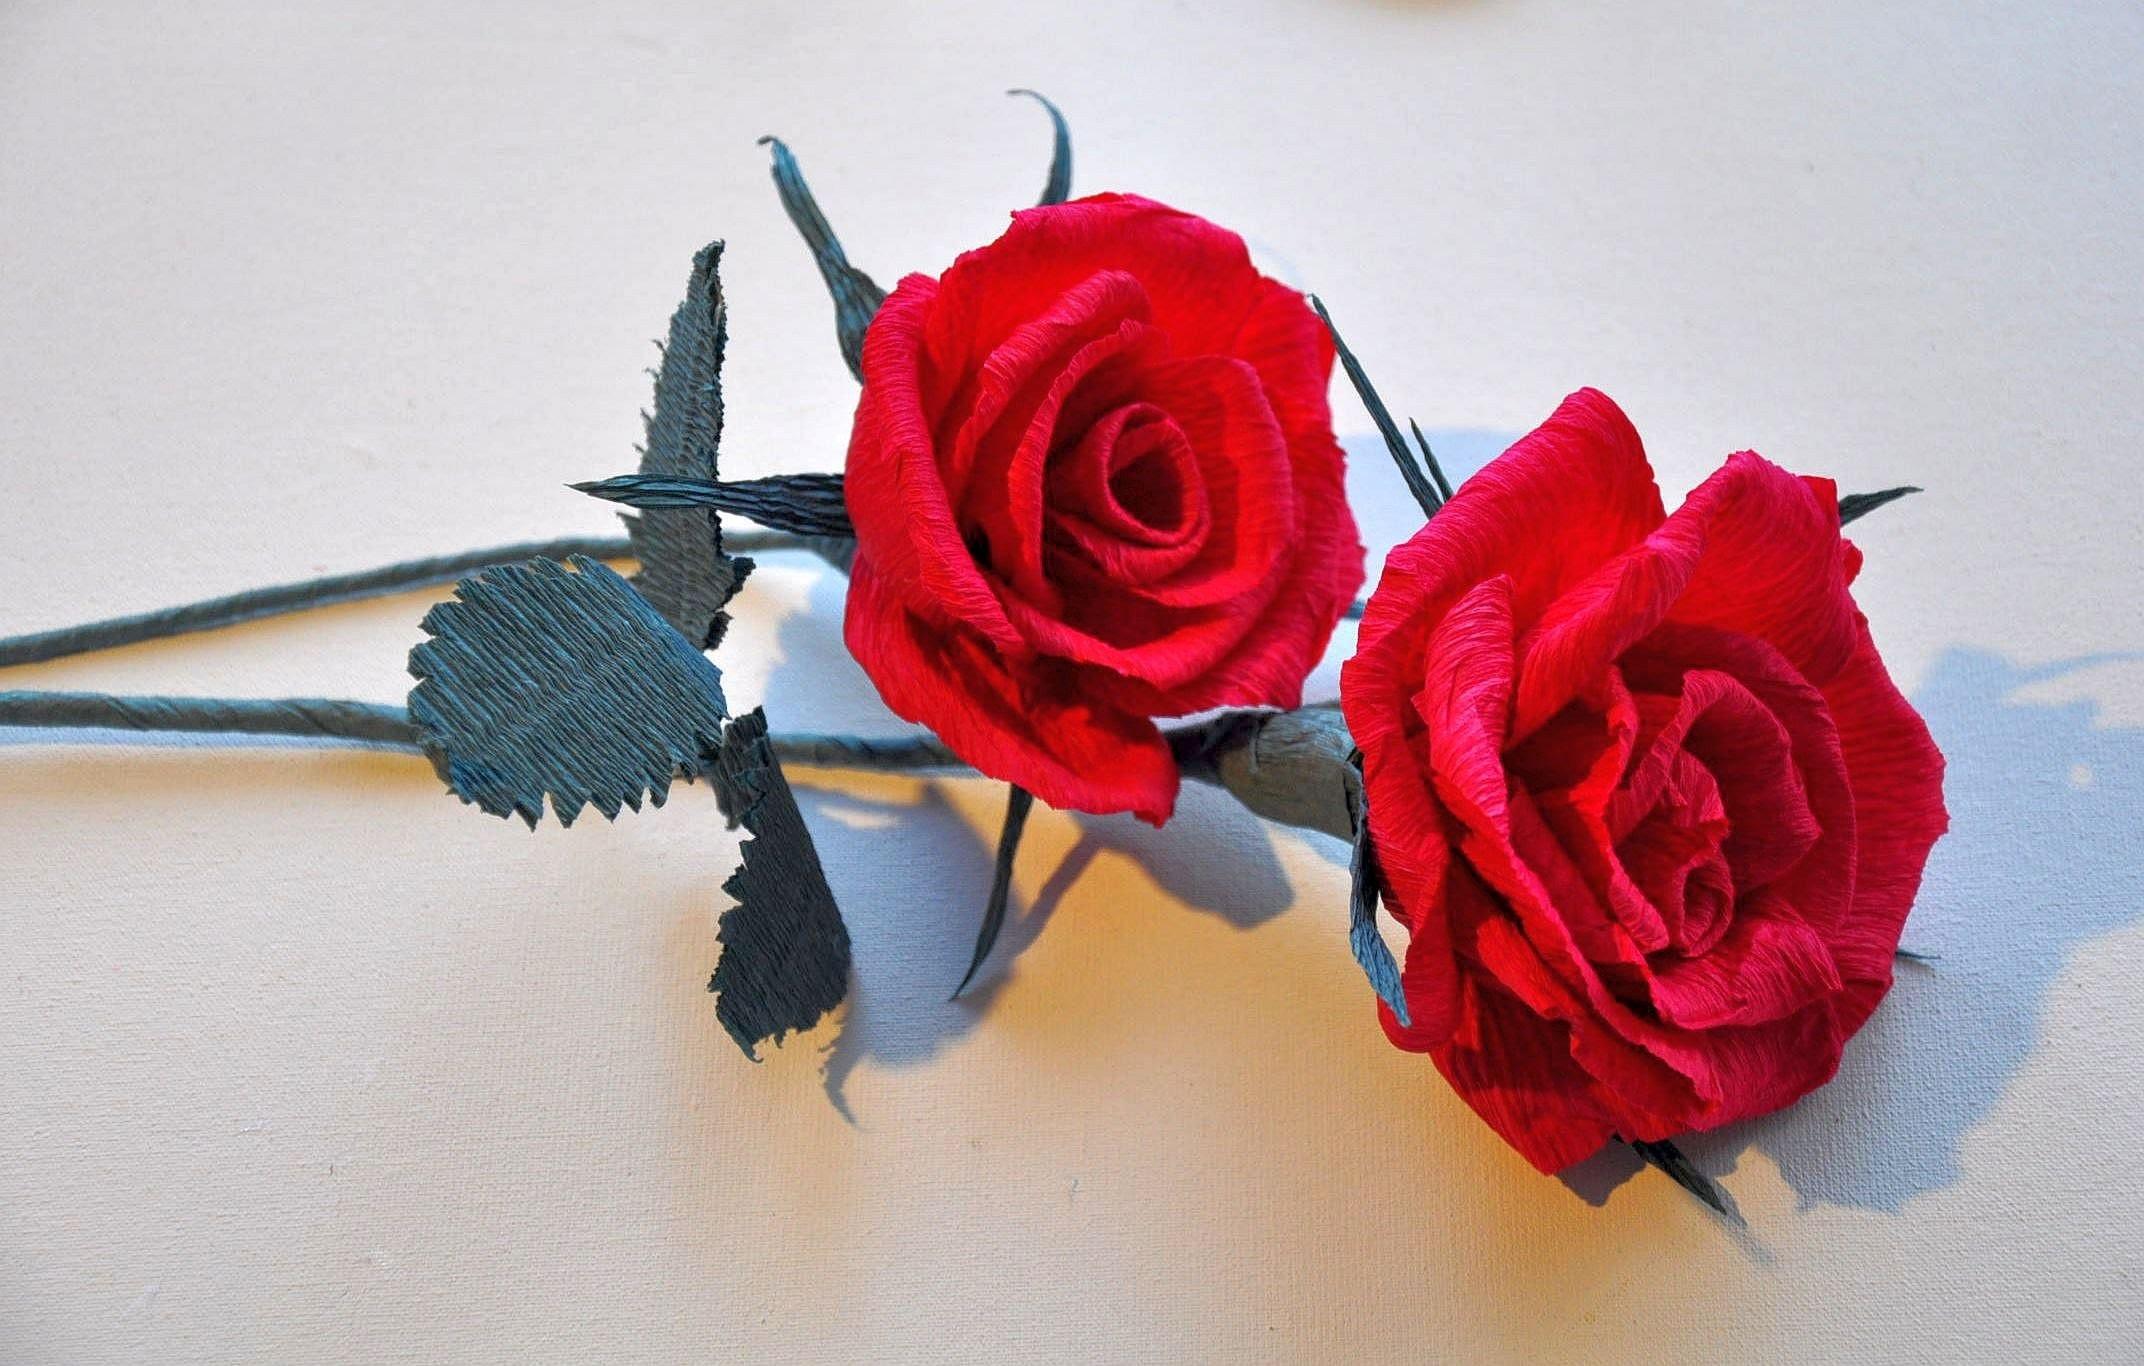 Róża z bibuły krok po kroku # Kwiaty z bibuły # Crepe paper rose DIY